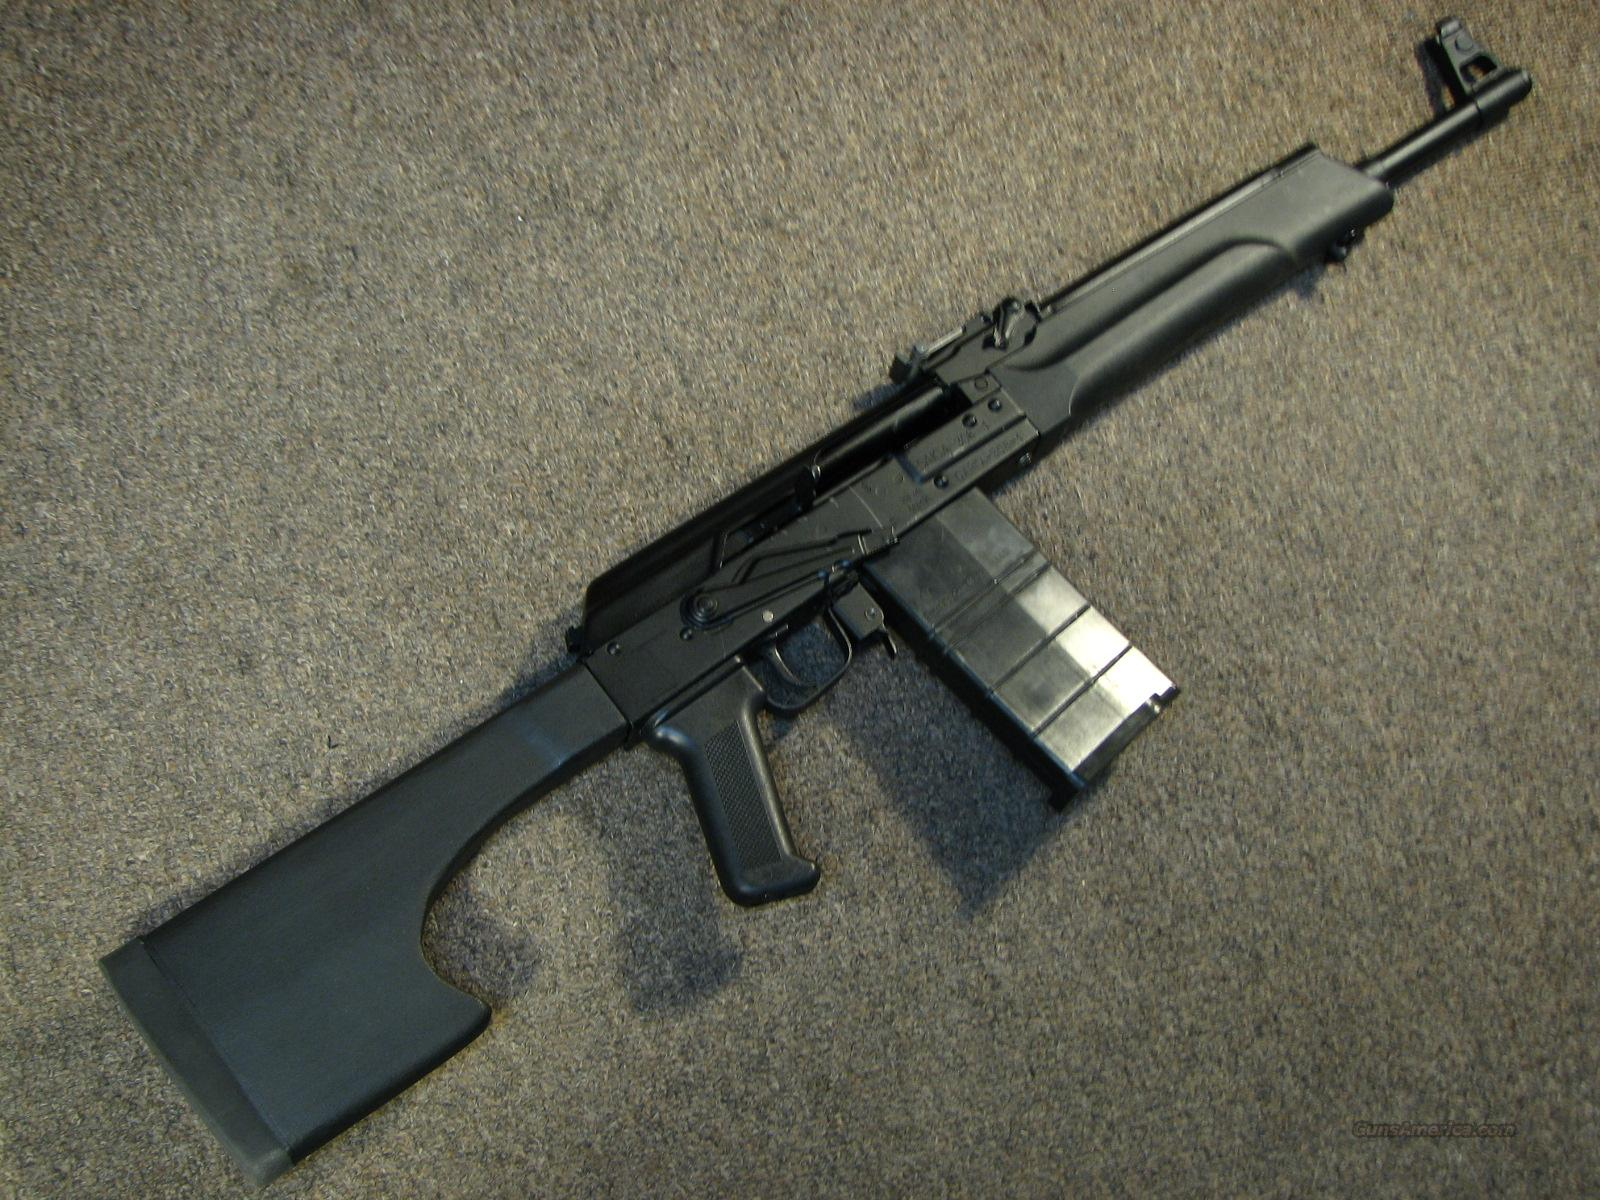 SAIGA .308 RIFLE for sale